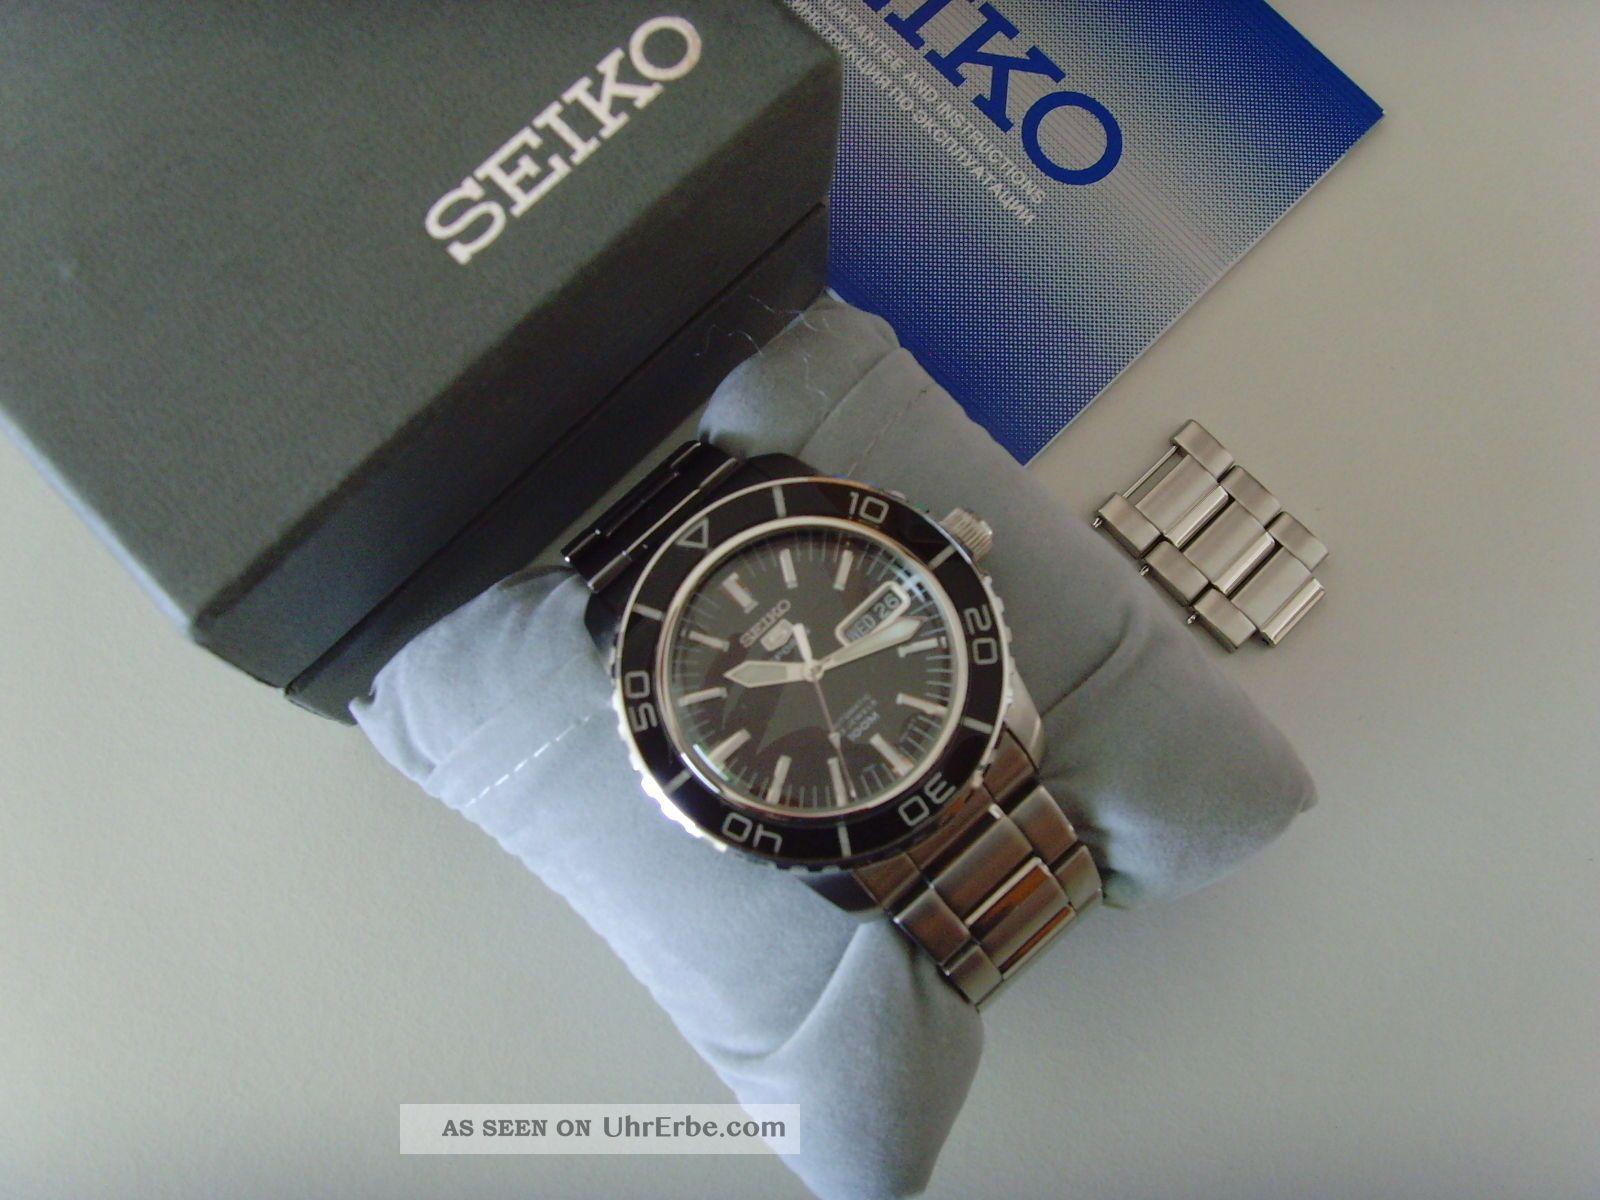 Snzh55k1 Seiko Armbanduhr Automatik Ovp 5 Sports Herrenuhr OPXZkiuT